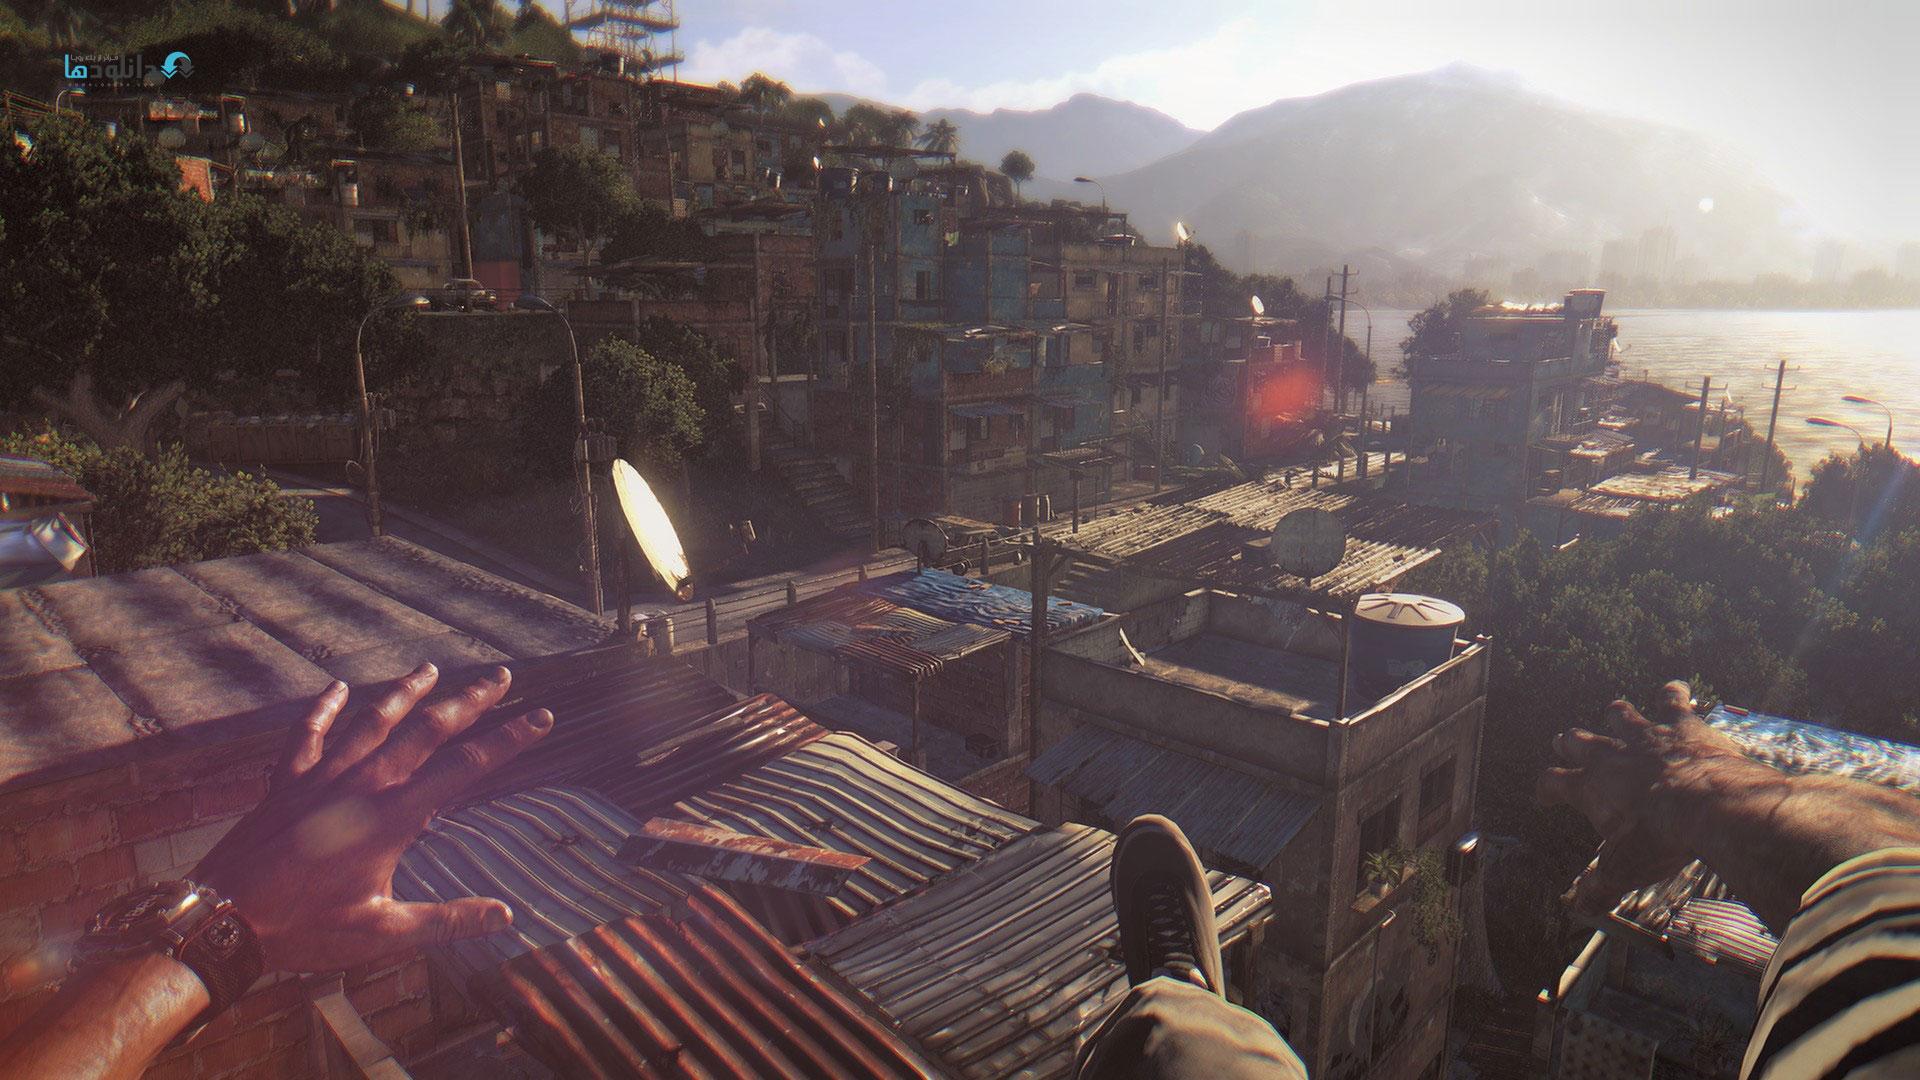 http://img5.downloadha.com/hosein/Game/January%202015/27/Dying-Light-screenshots-05-large.jpg